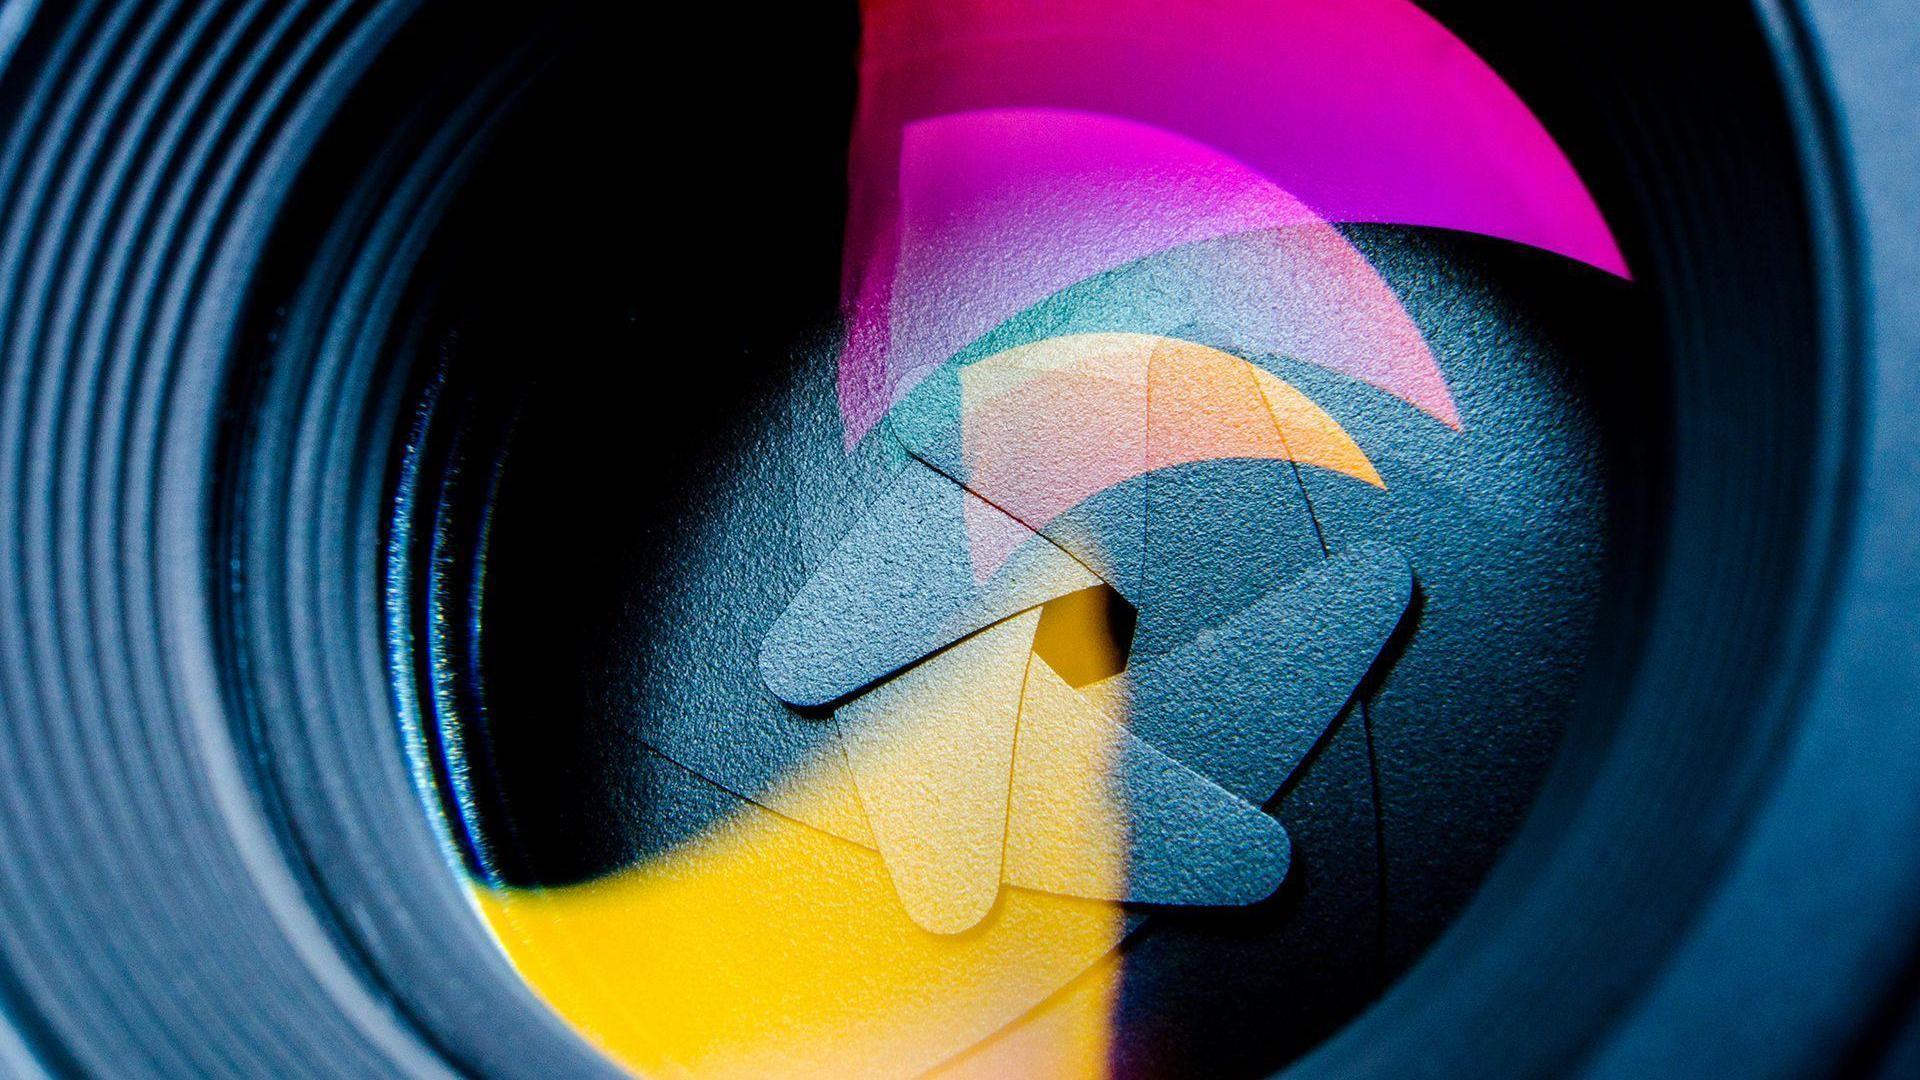 Camera lens Camera Photography Lens HD Wallpapers, Desktop ...